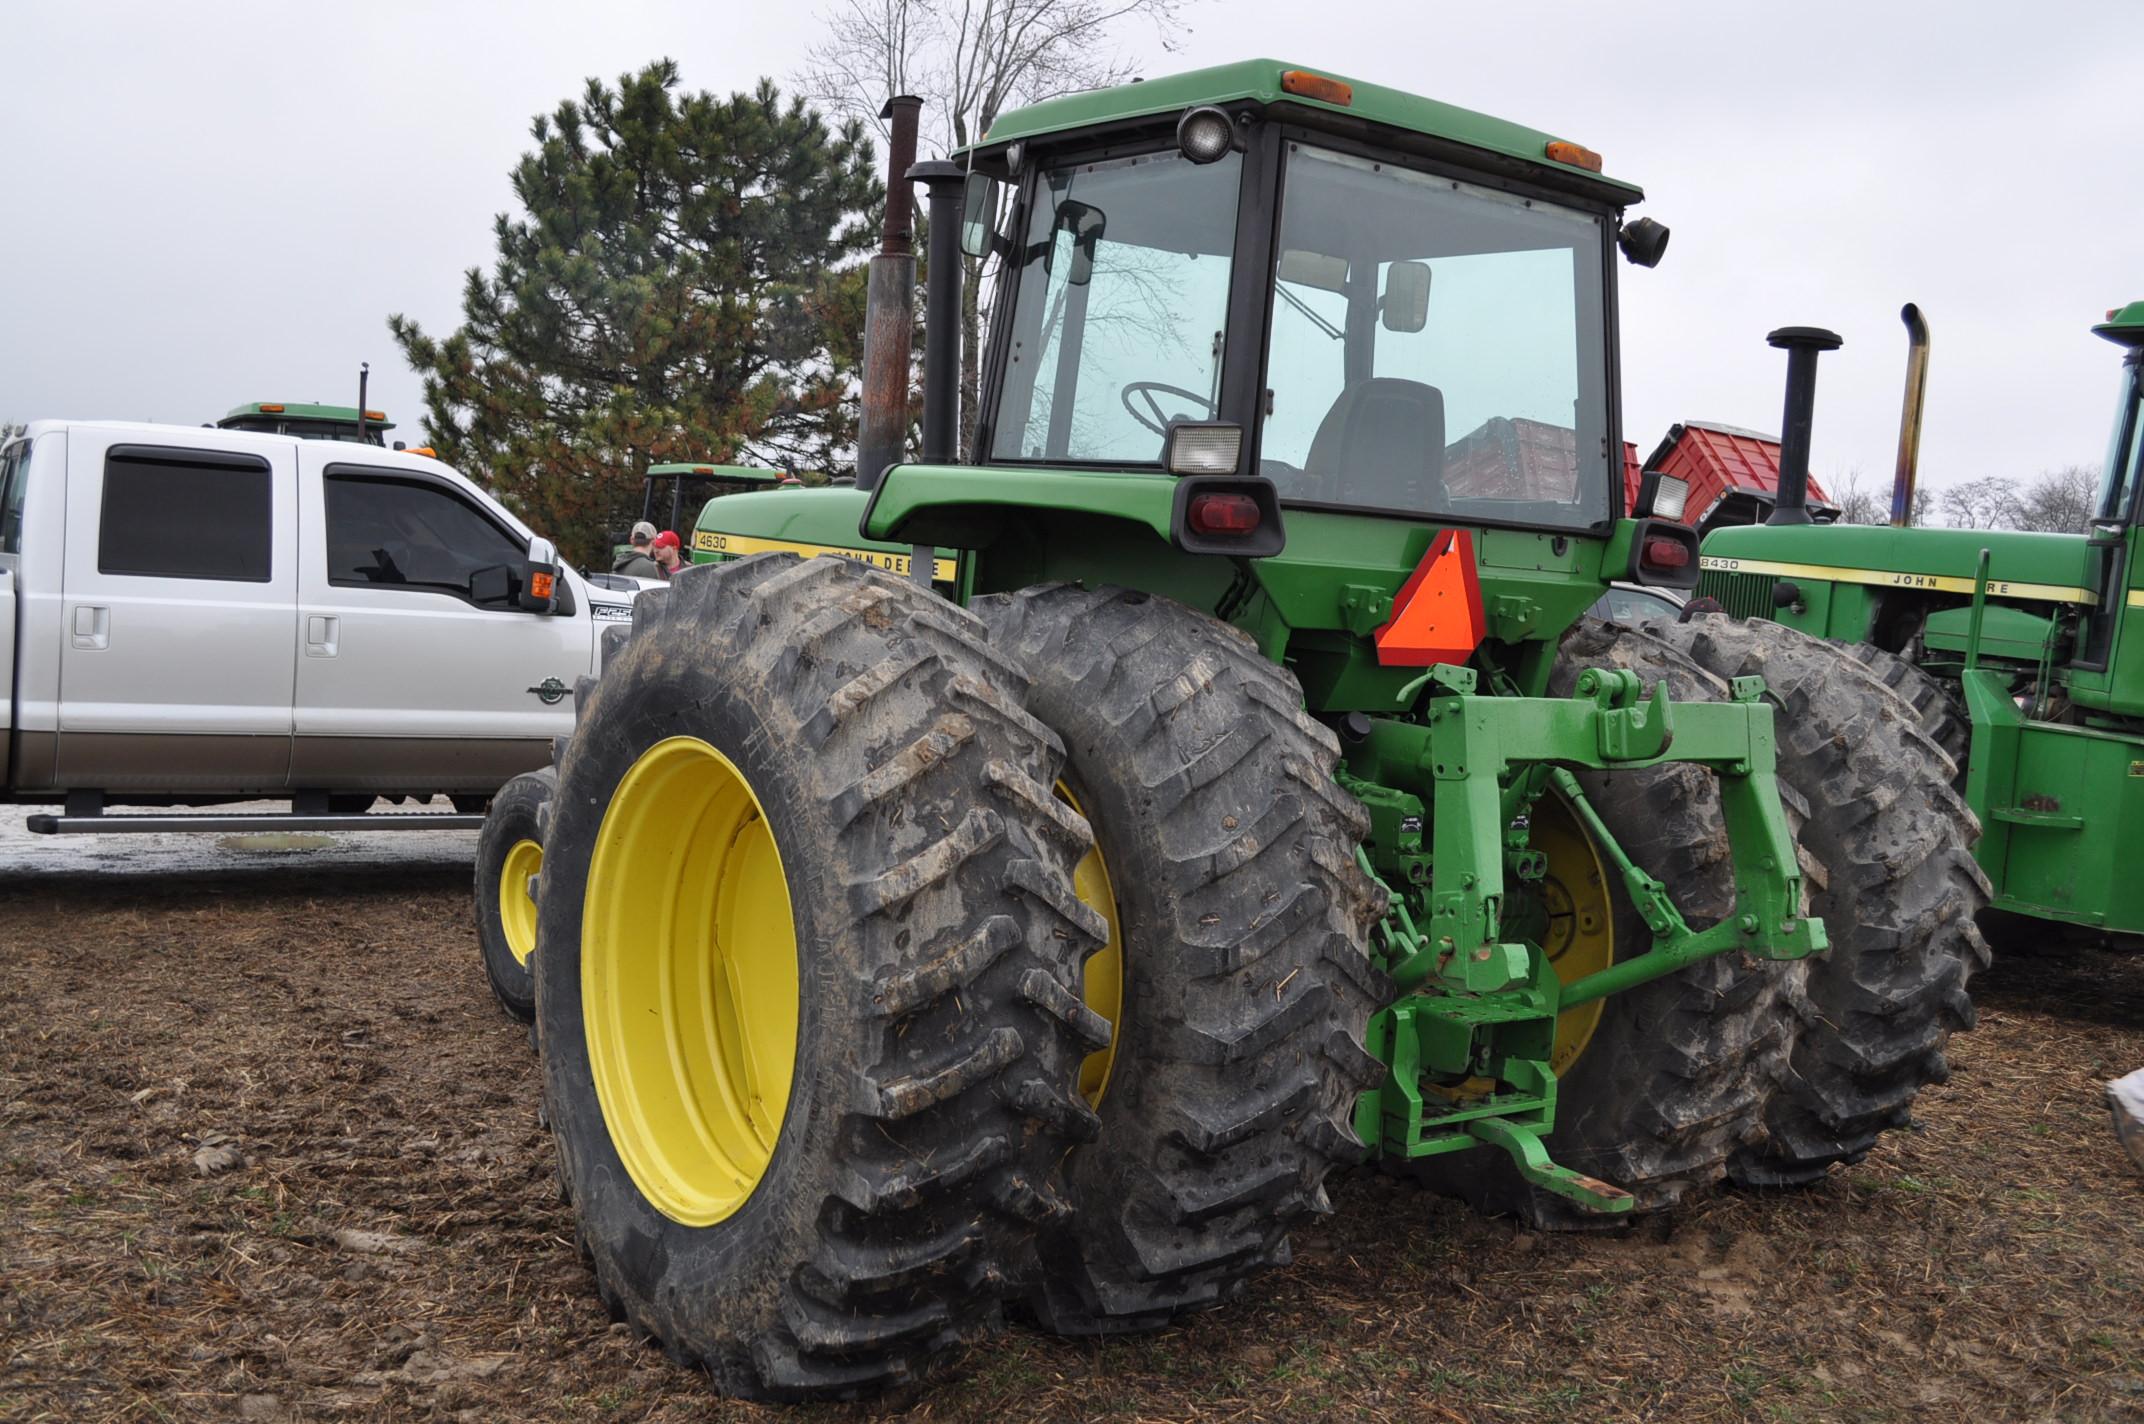 John Deere 4630 tractor, diesel, 20.8-38 hub duals, 14L-16 front, CHA, Quad range, 2 hyd remotes, - Image 2 of 22